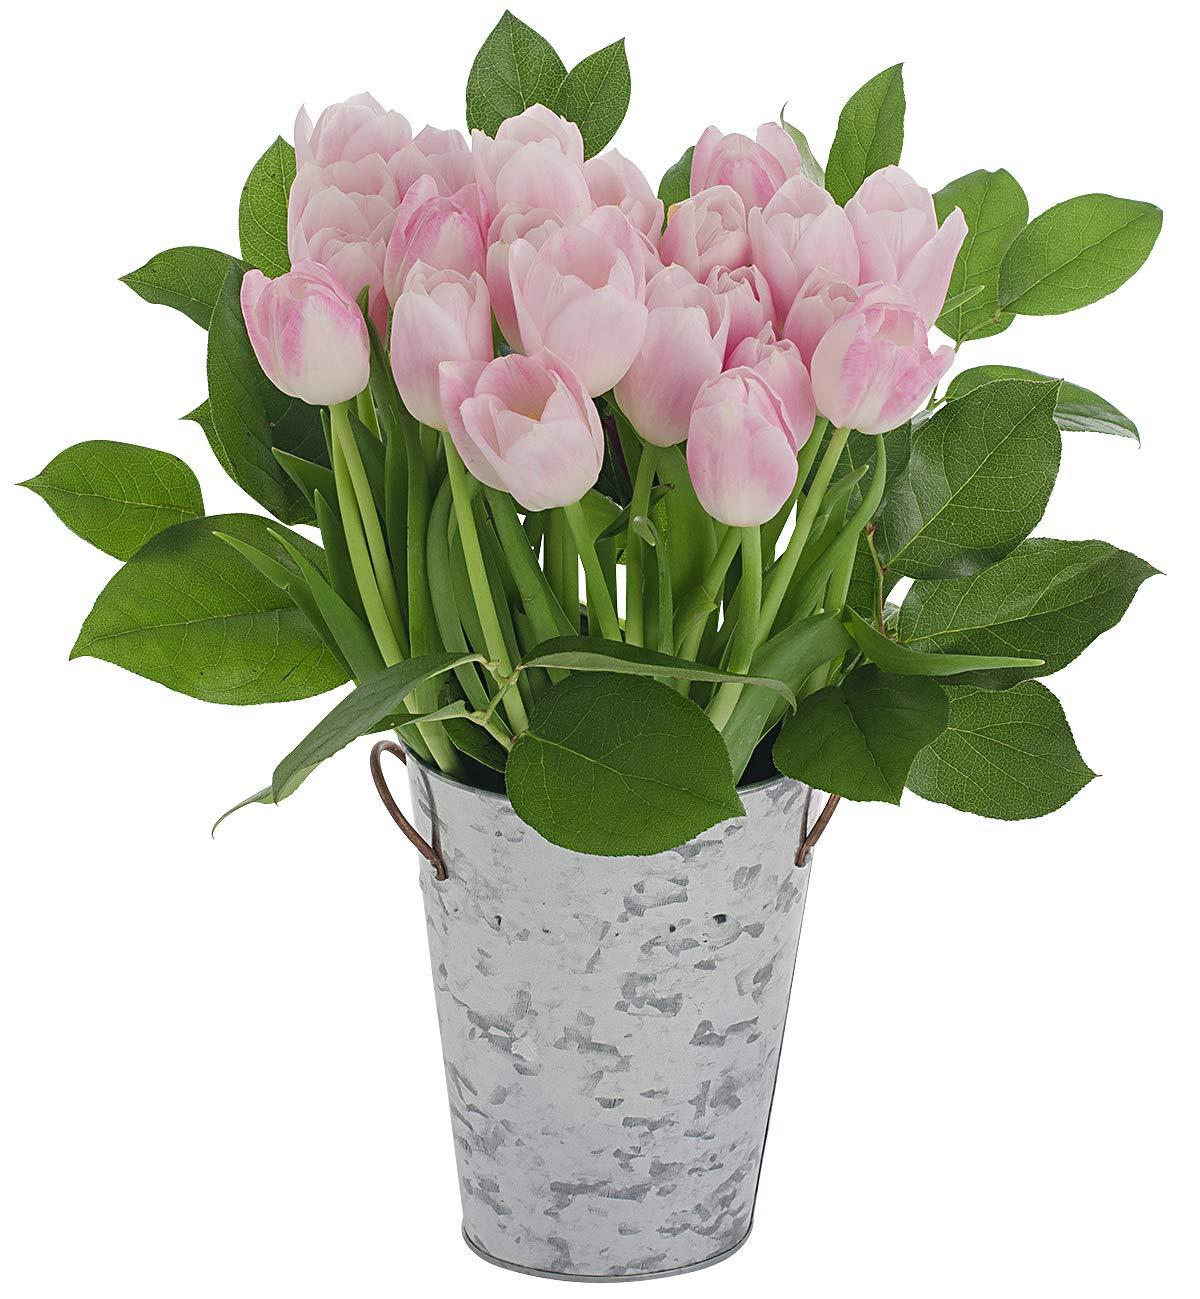 Stargazer Barn Blushing Bouquet 2 Dozen Light Pink Tulips with French Bucket Style Vase by Stargazer Barn